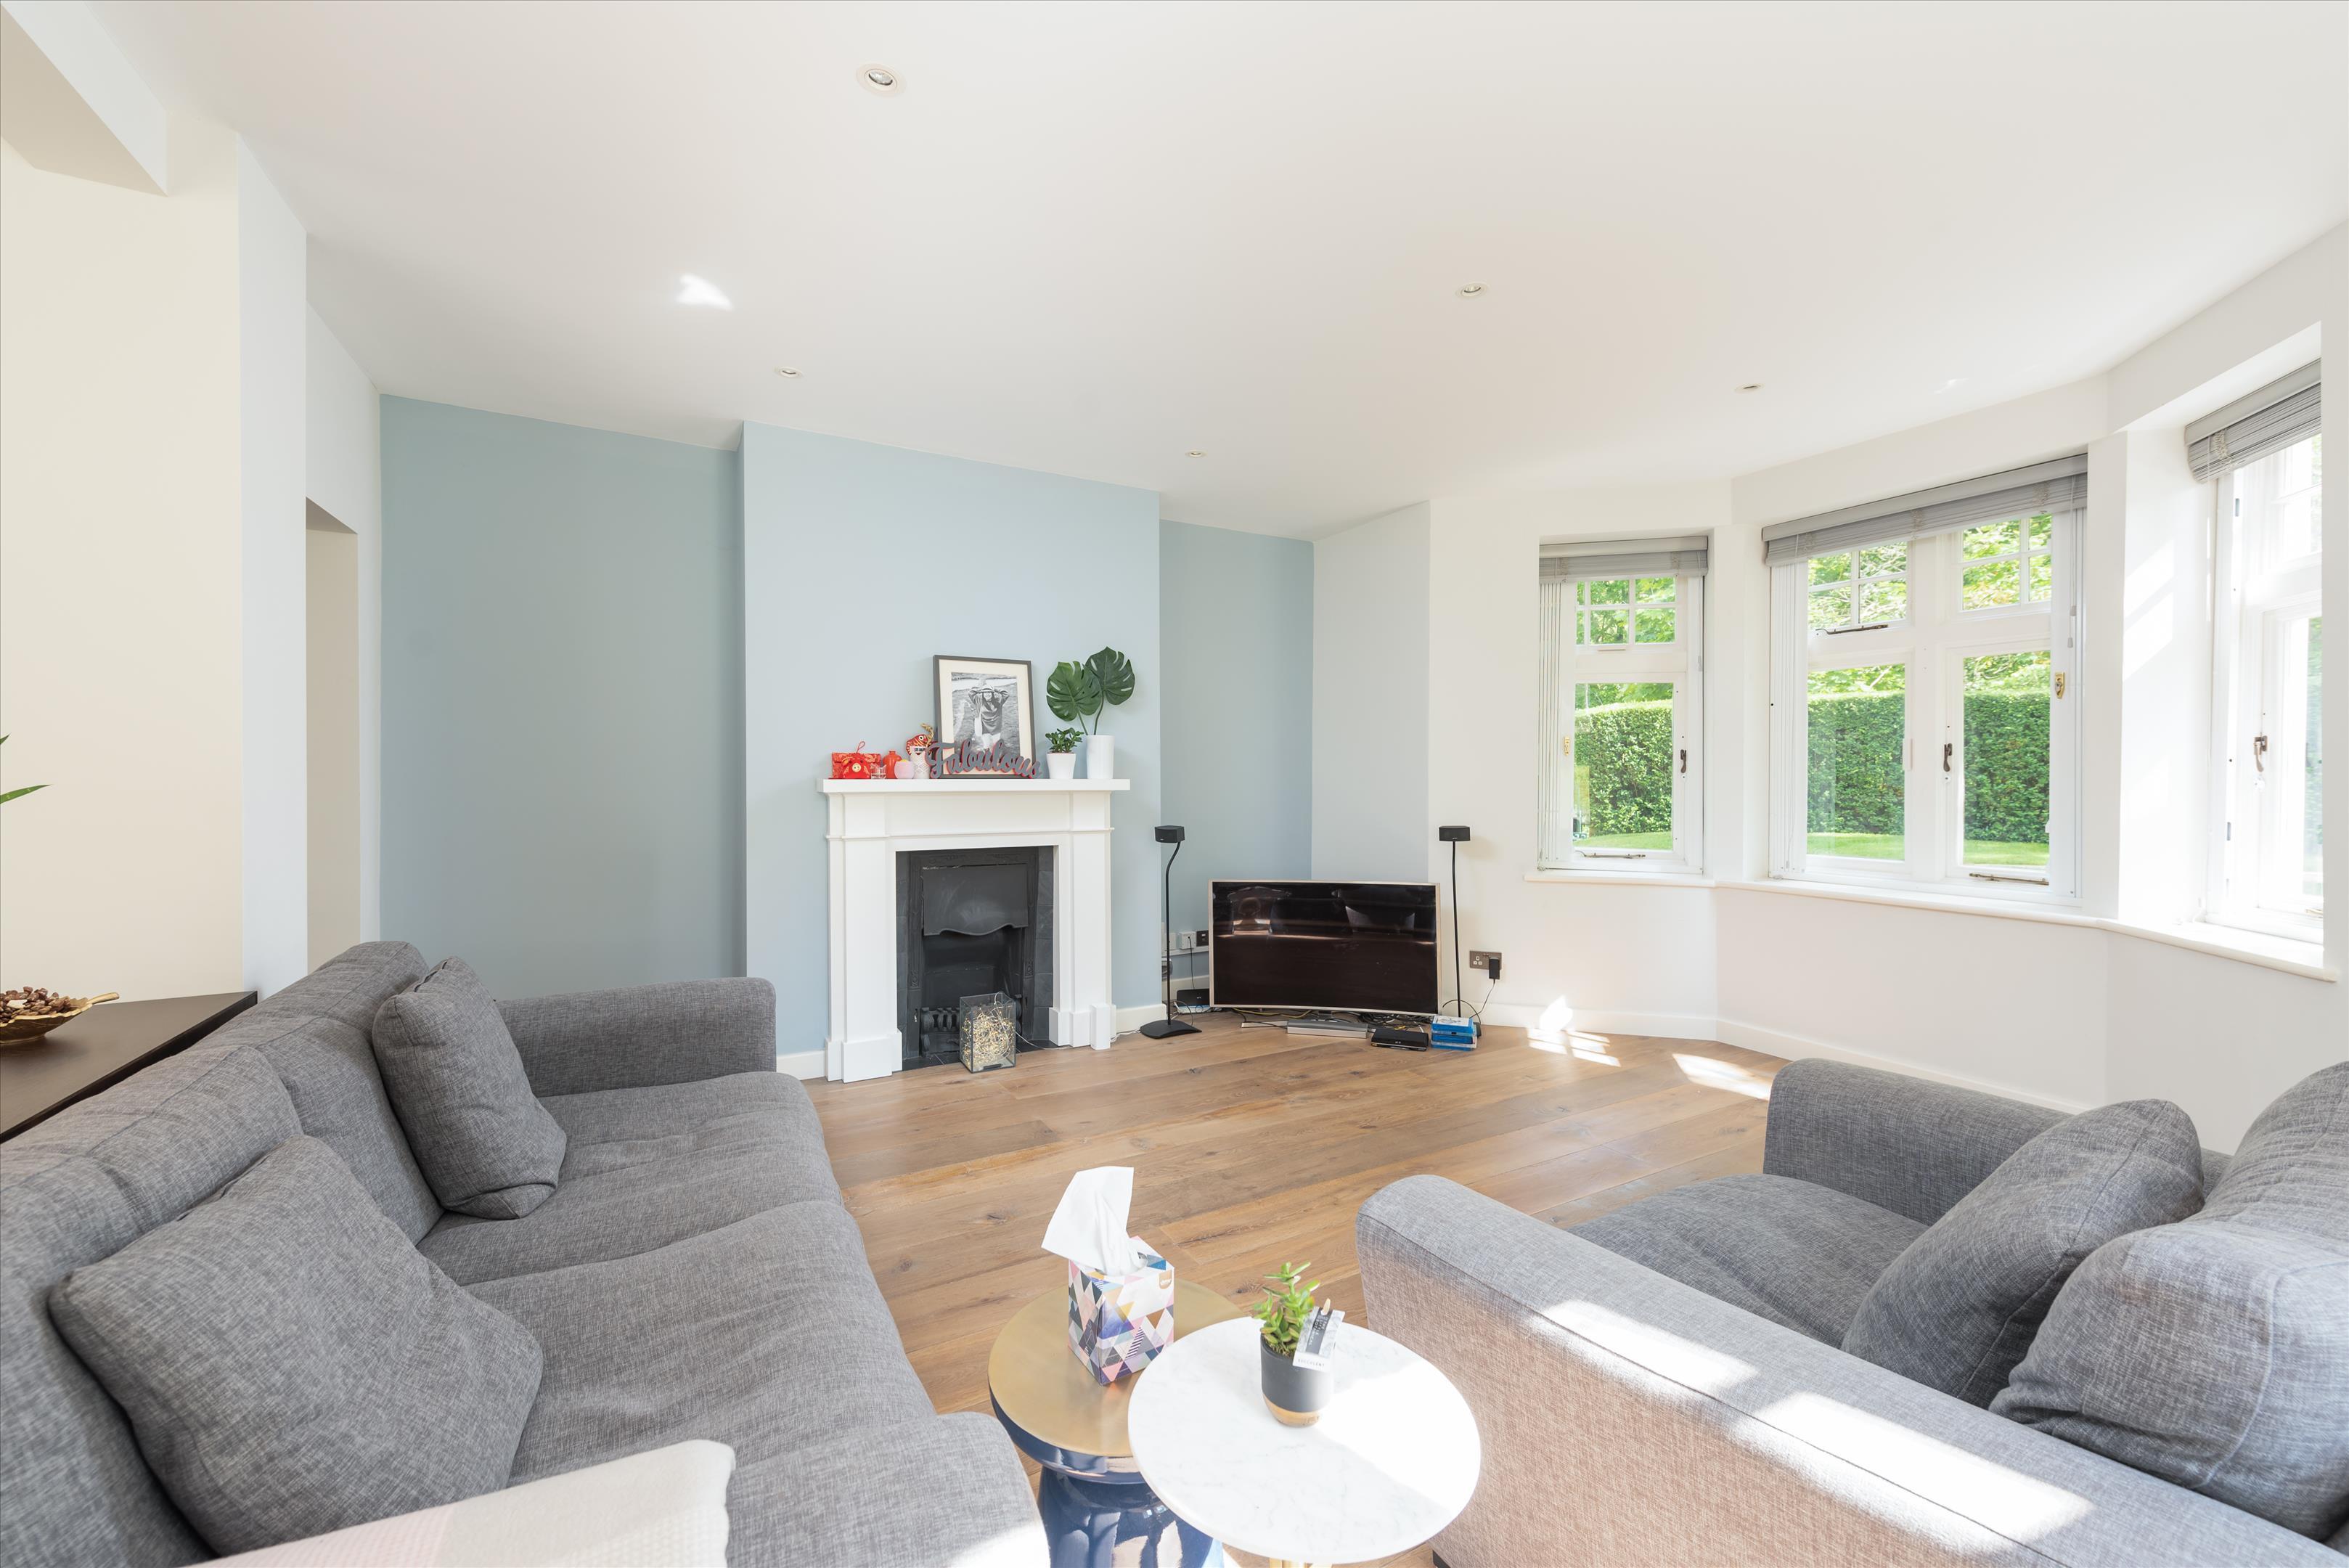 6 E Heath Rd, London NW3 1BP, UK - Source: Knight Frank